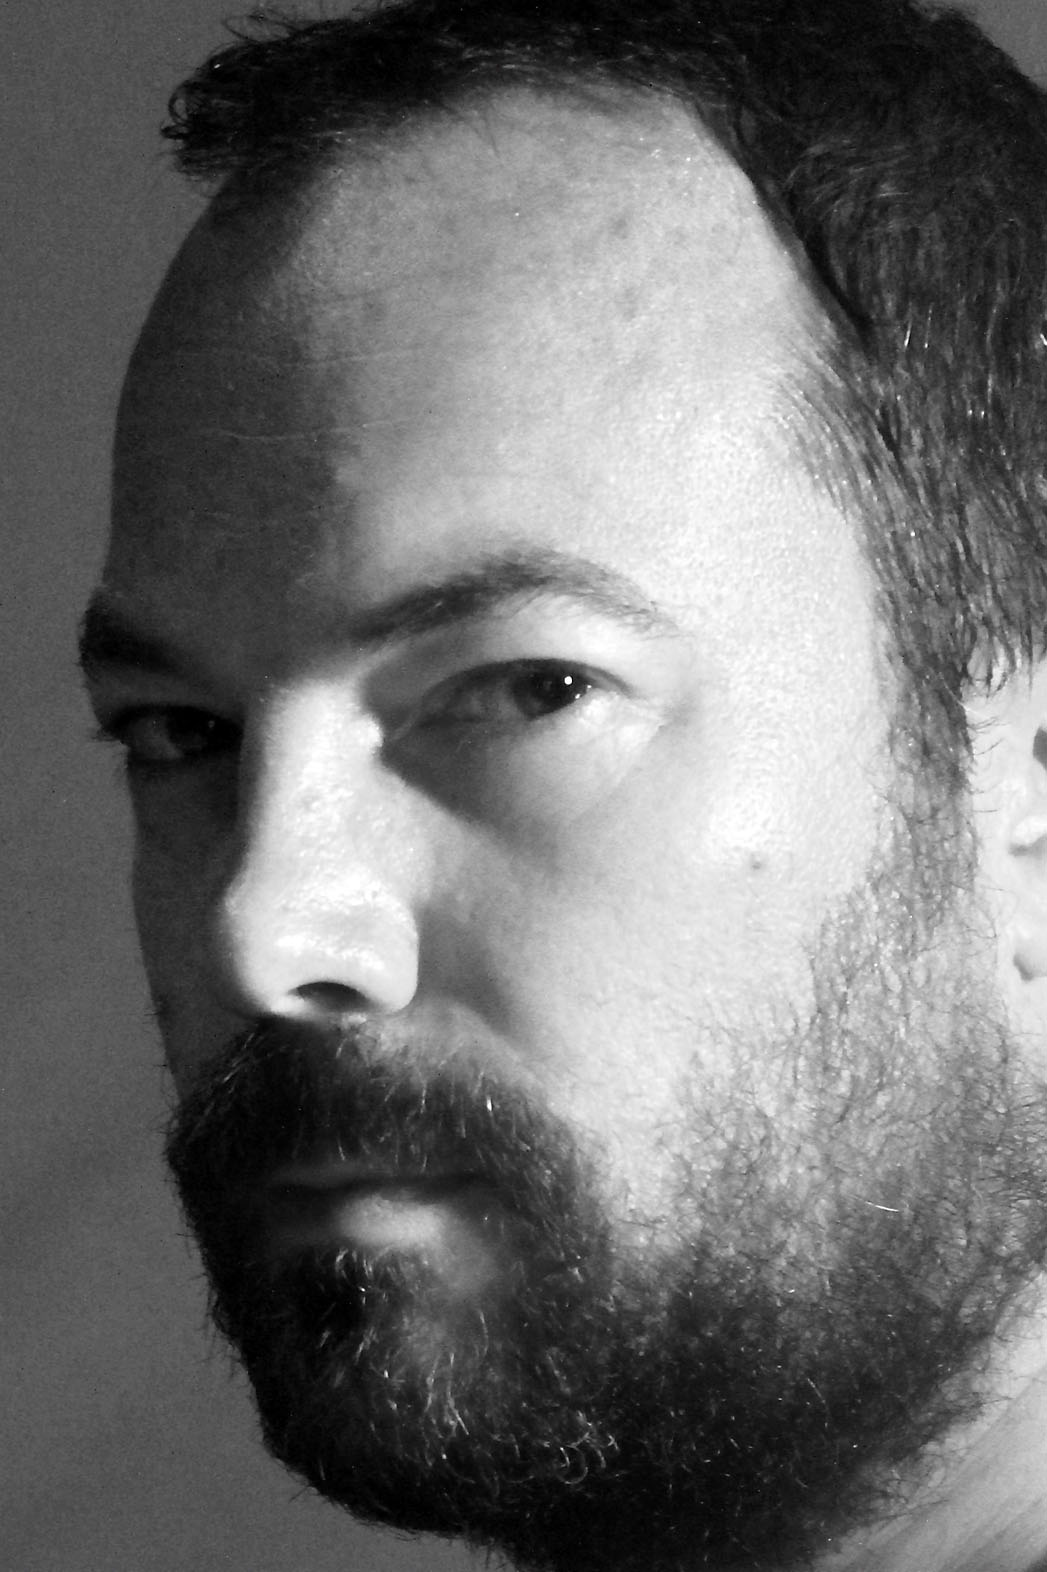 Simon Rumley Headshot - P 2013